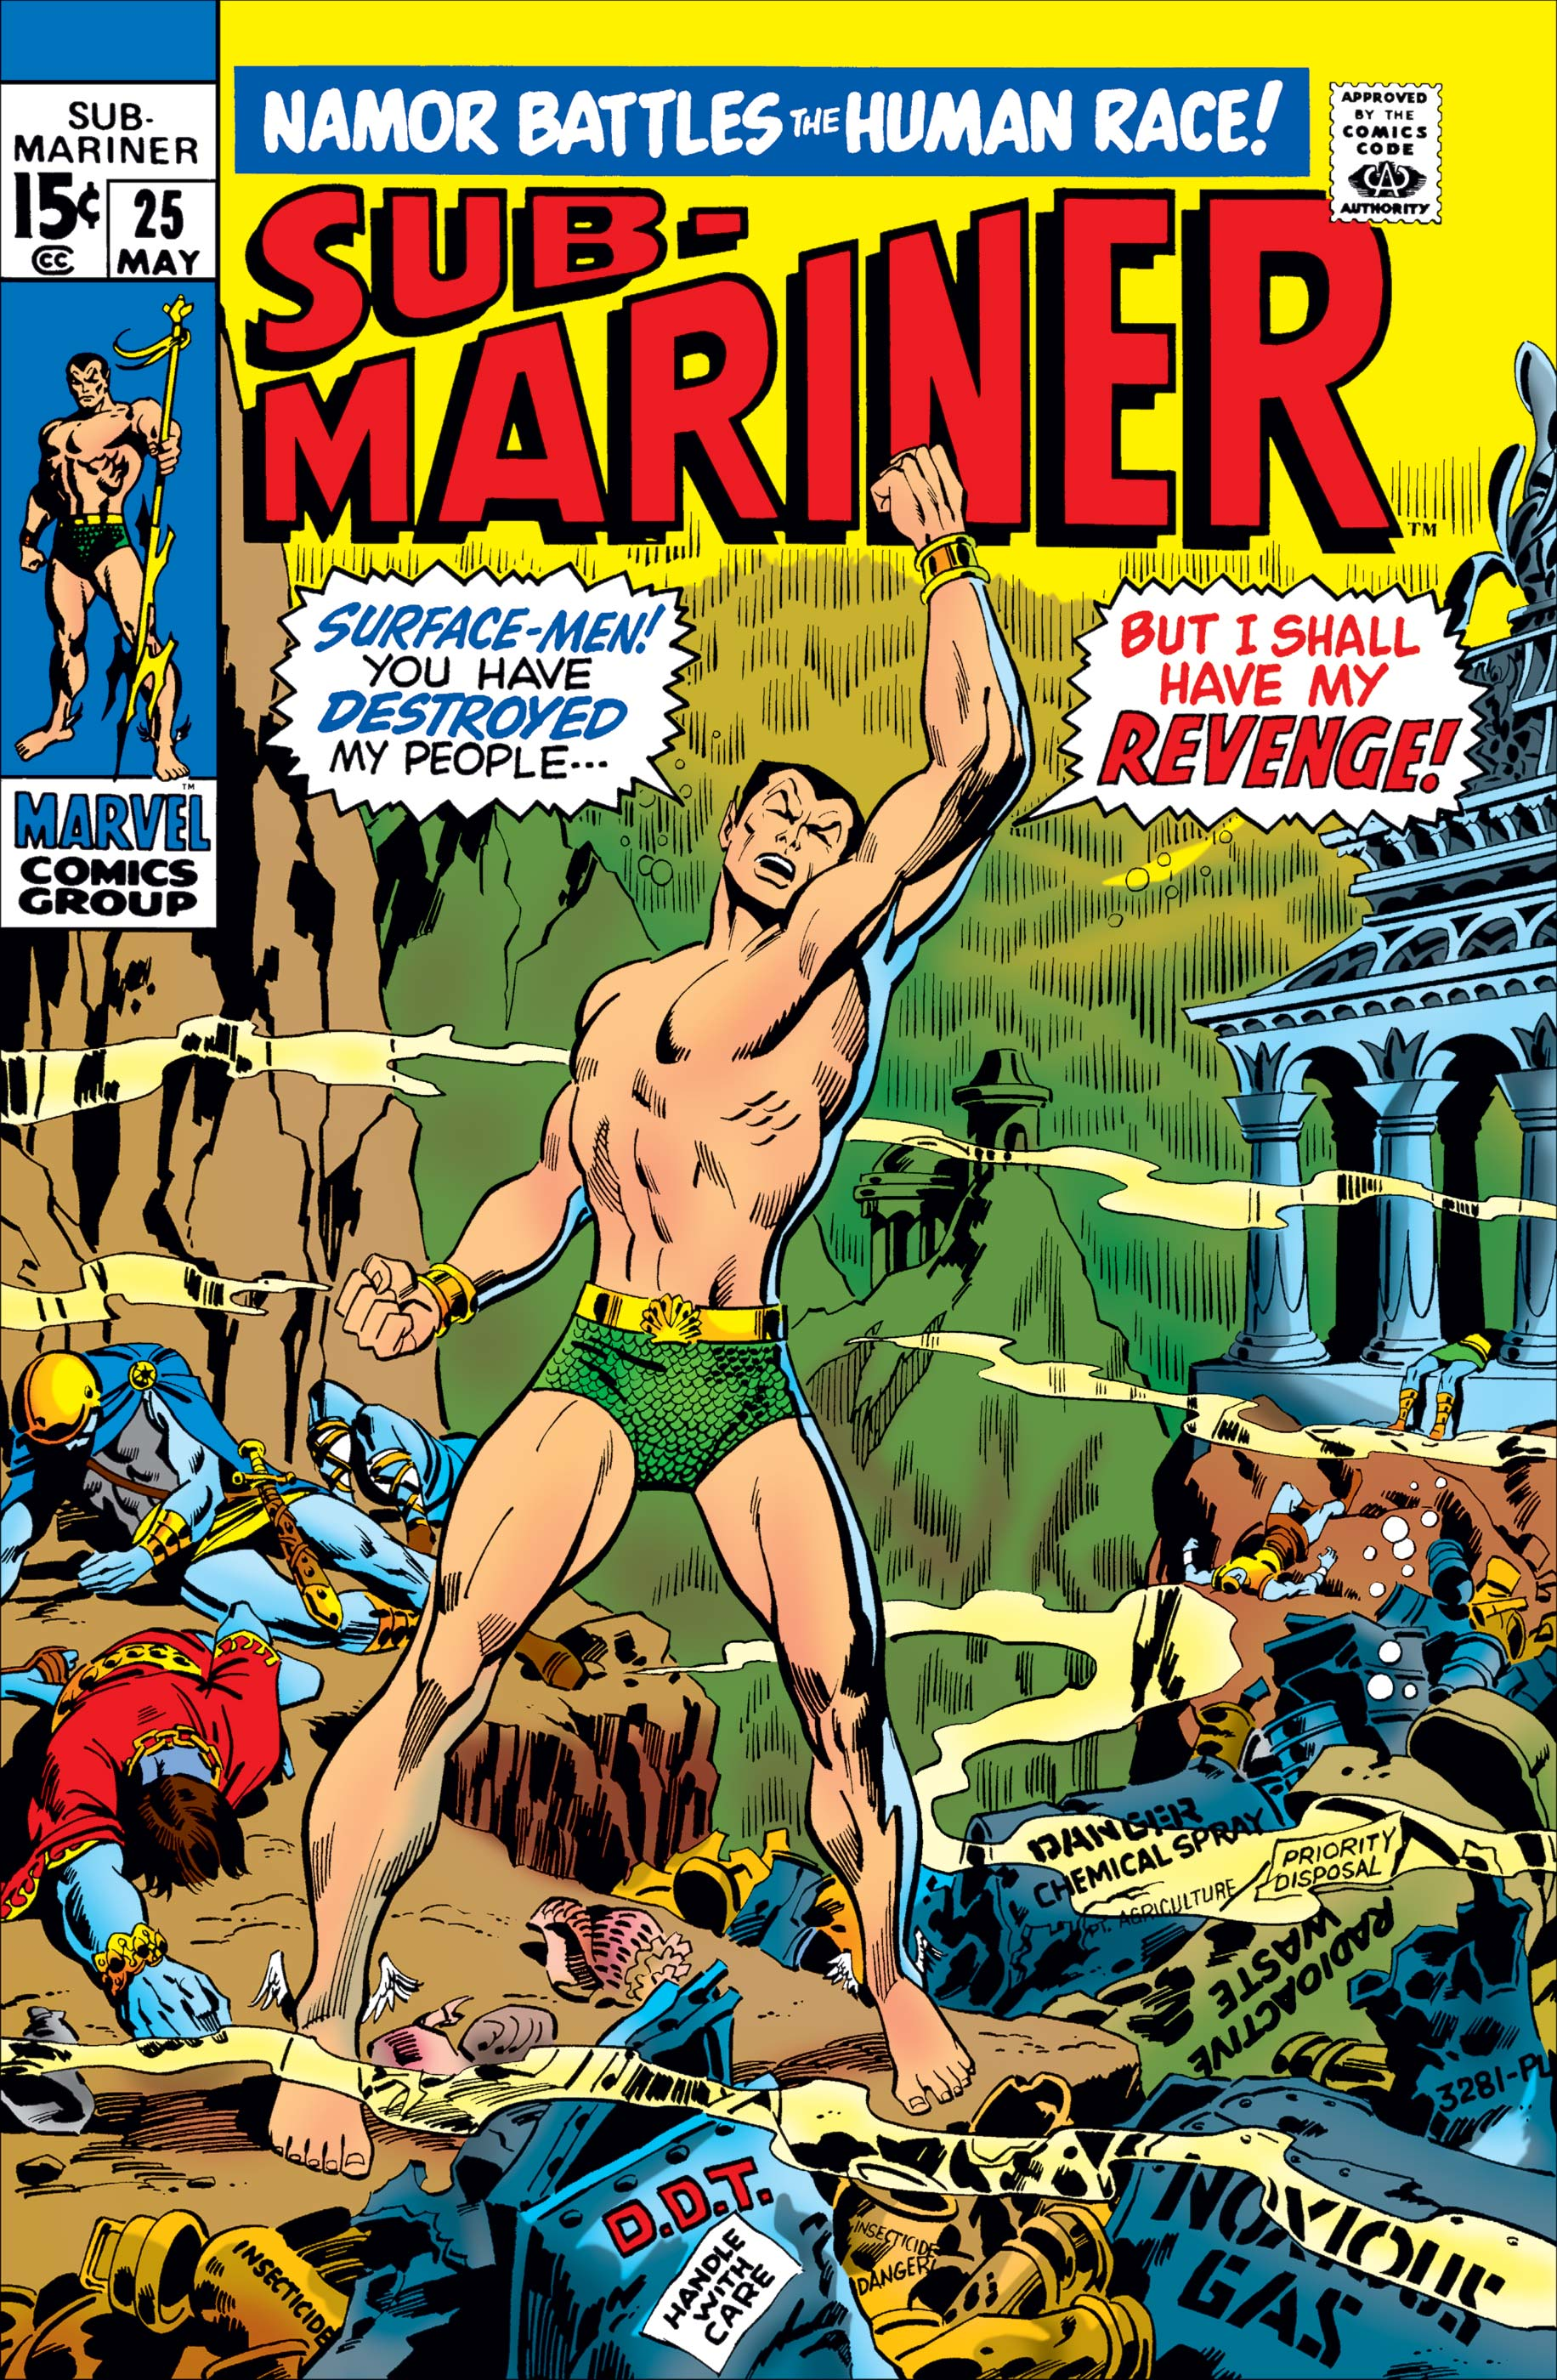 Sub-Mariner (1968) #25